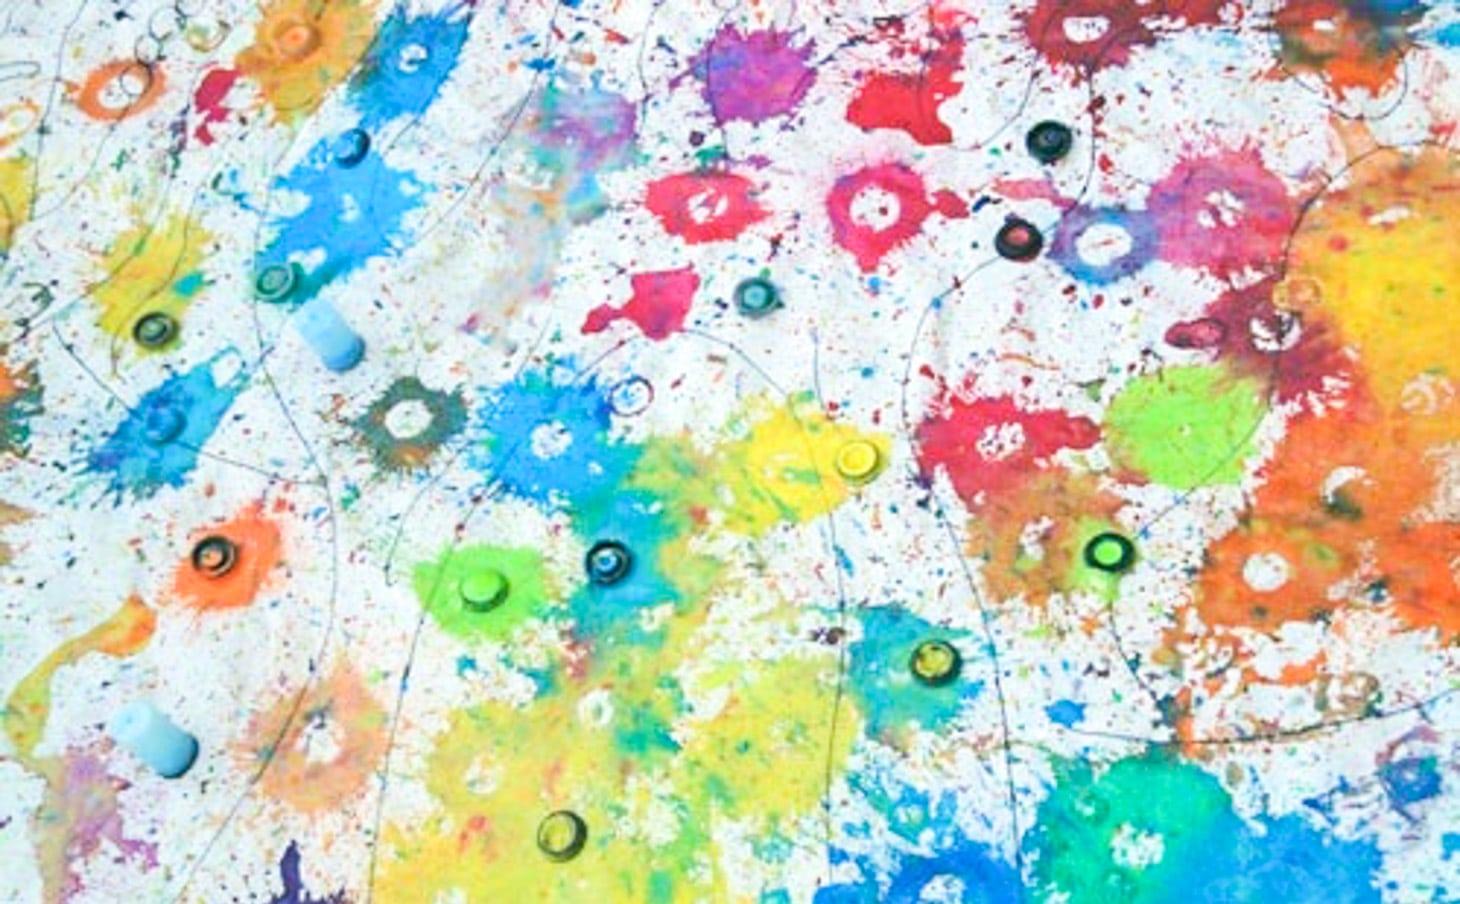 Paint splatters on a canvas.